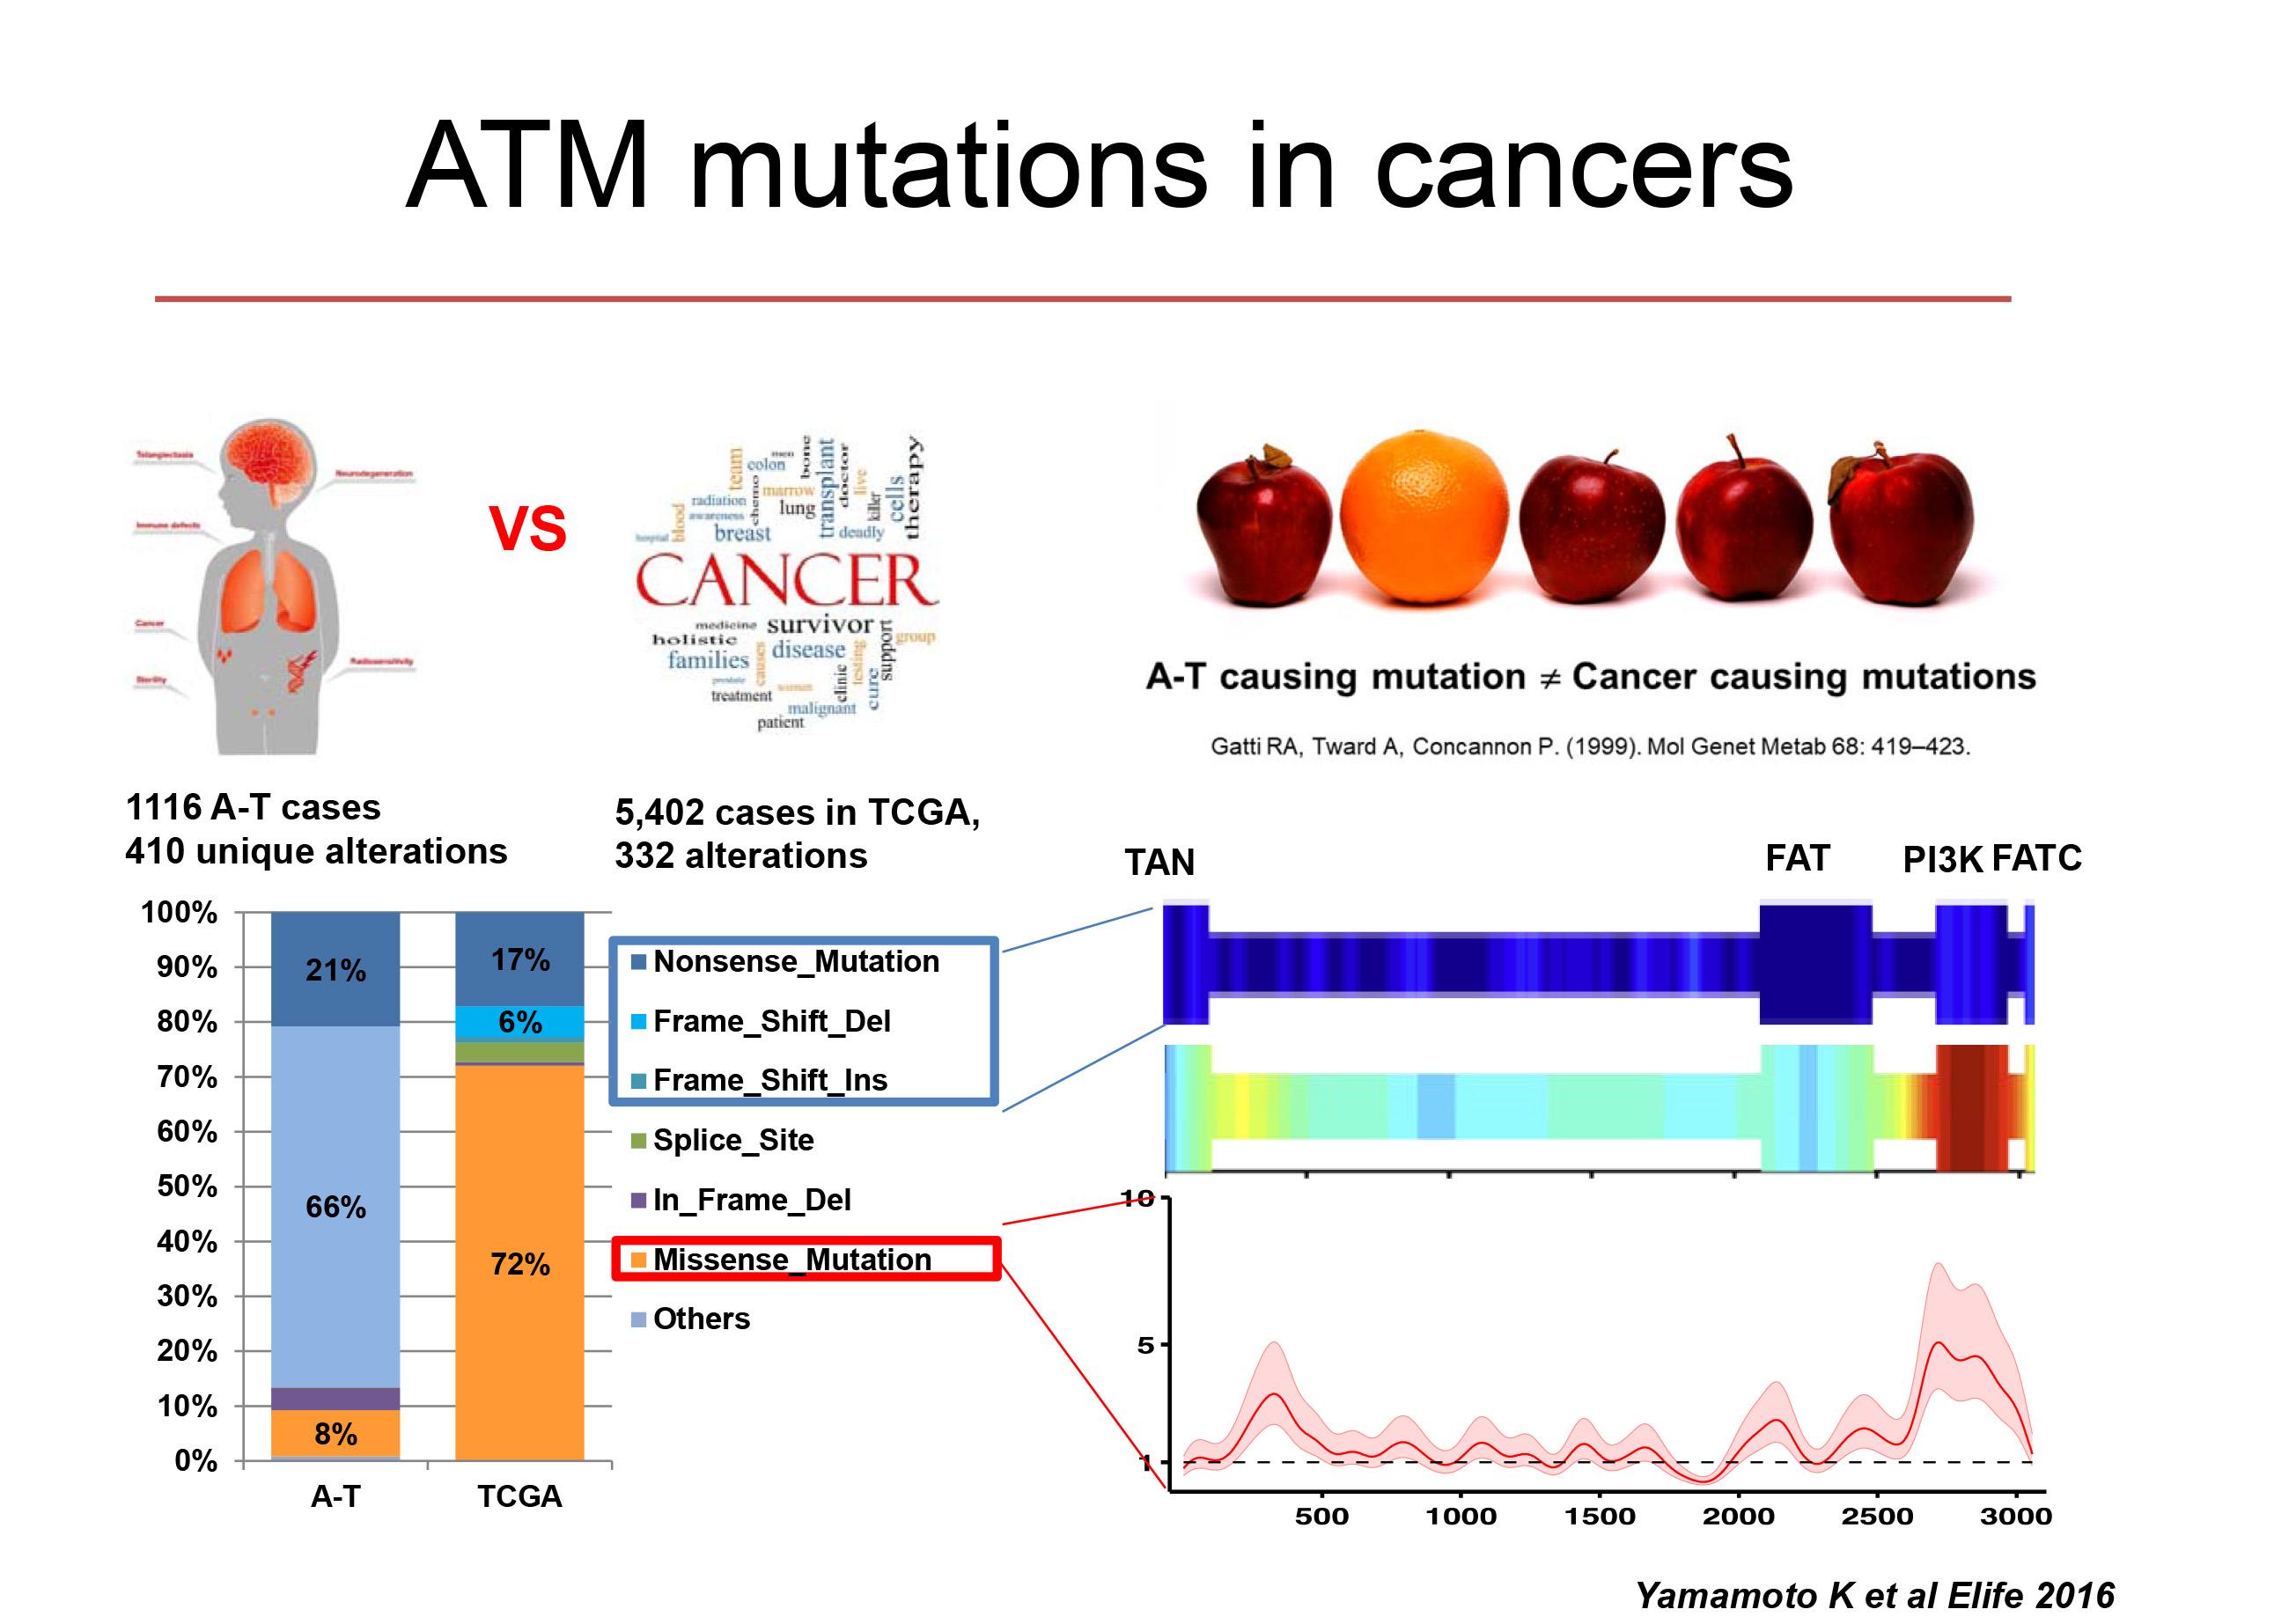 ATM cancer